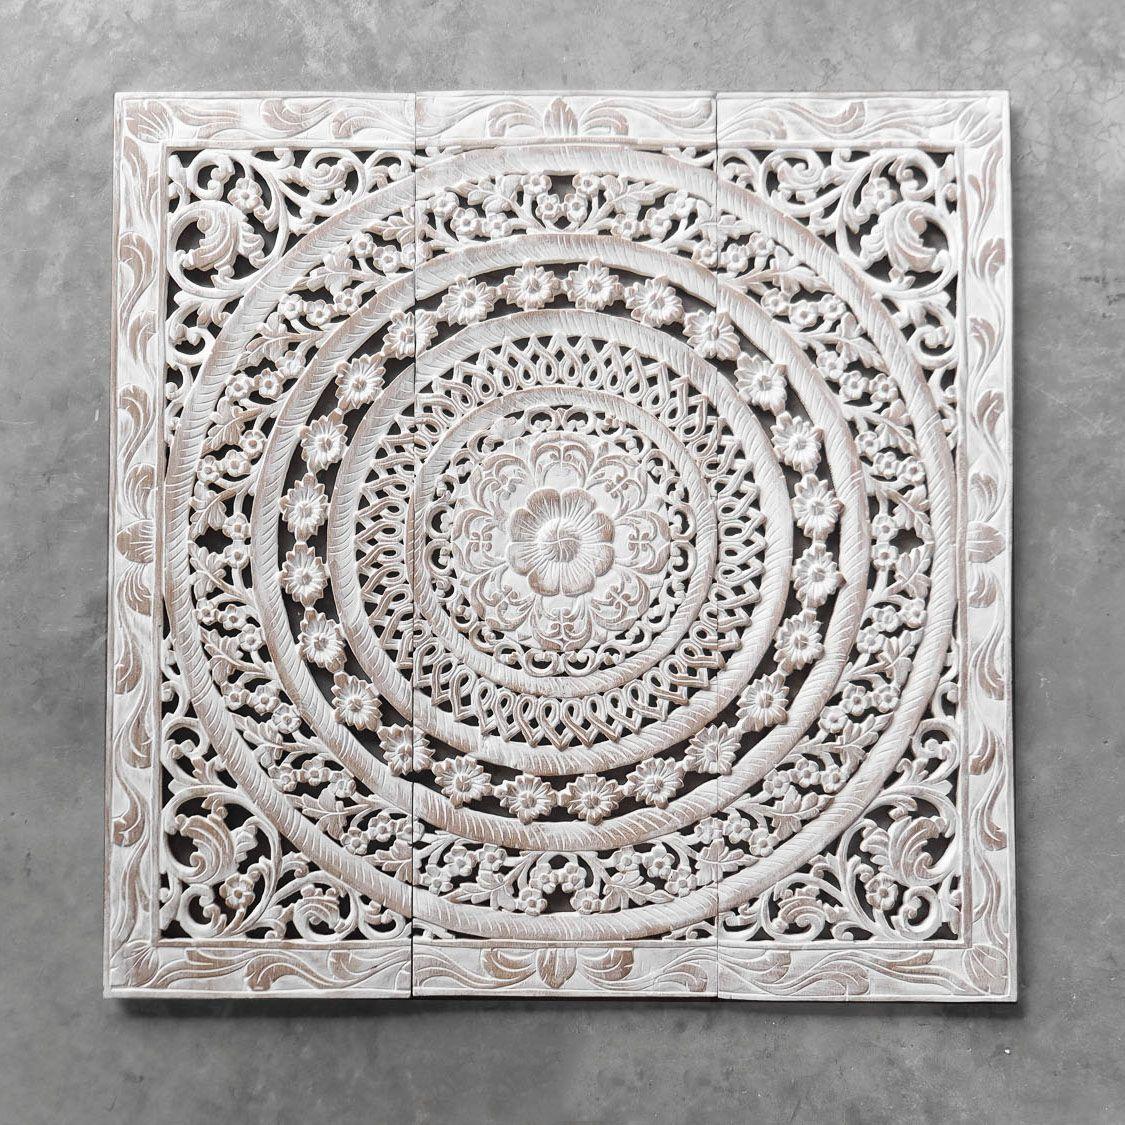 Moroccan Decent Wood Carving Wall Art Hanging Prostoj Domashnij Dekor Domashnij Dekor Dizajn